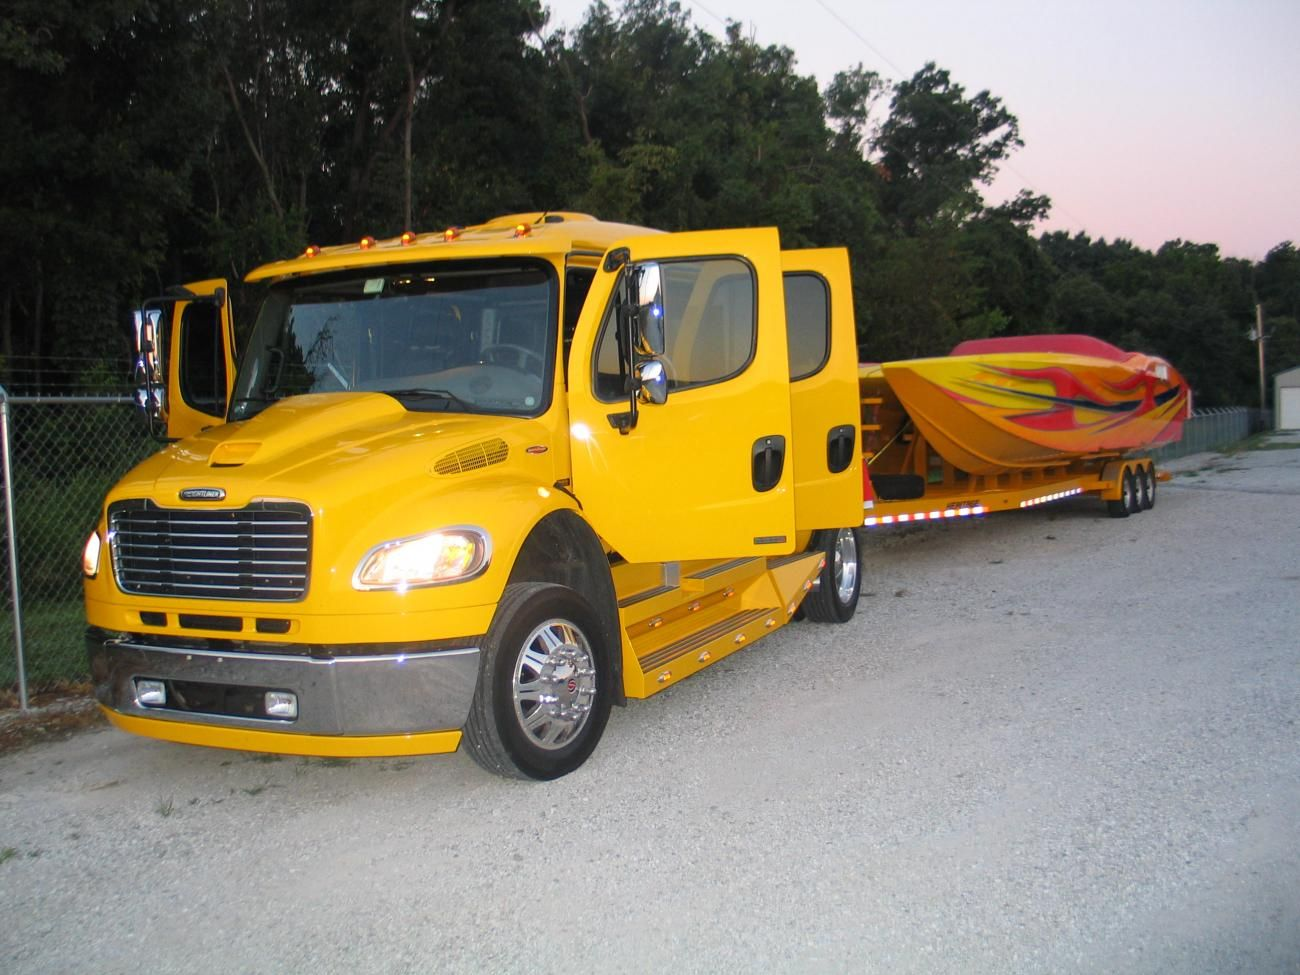 medium resolution of custom freightliner hauler extreme suv luxury toy haulers